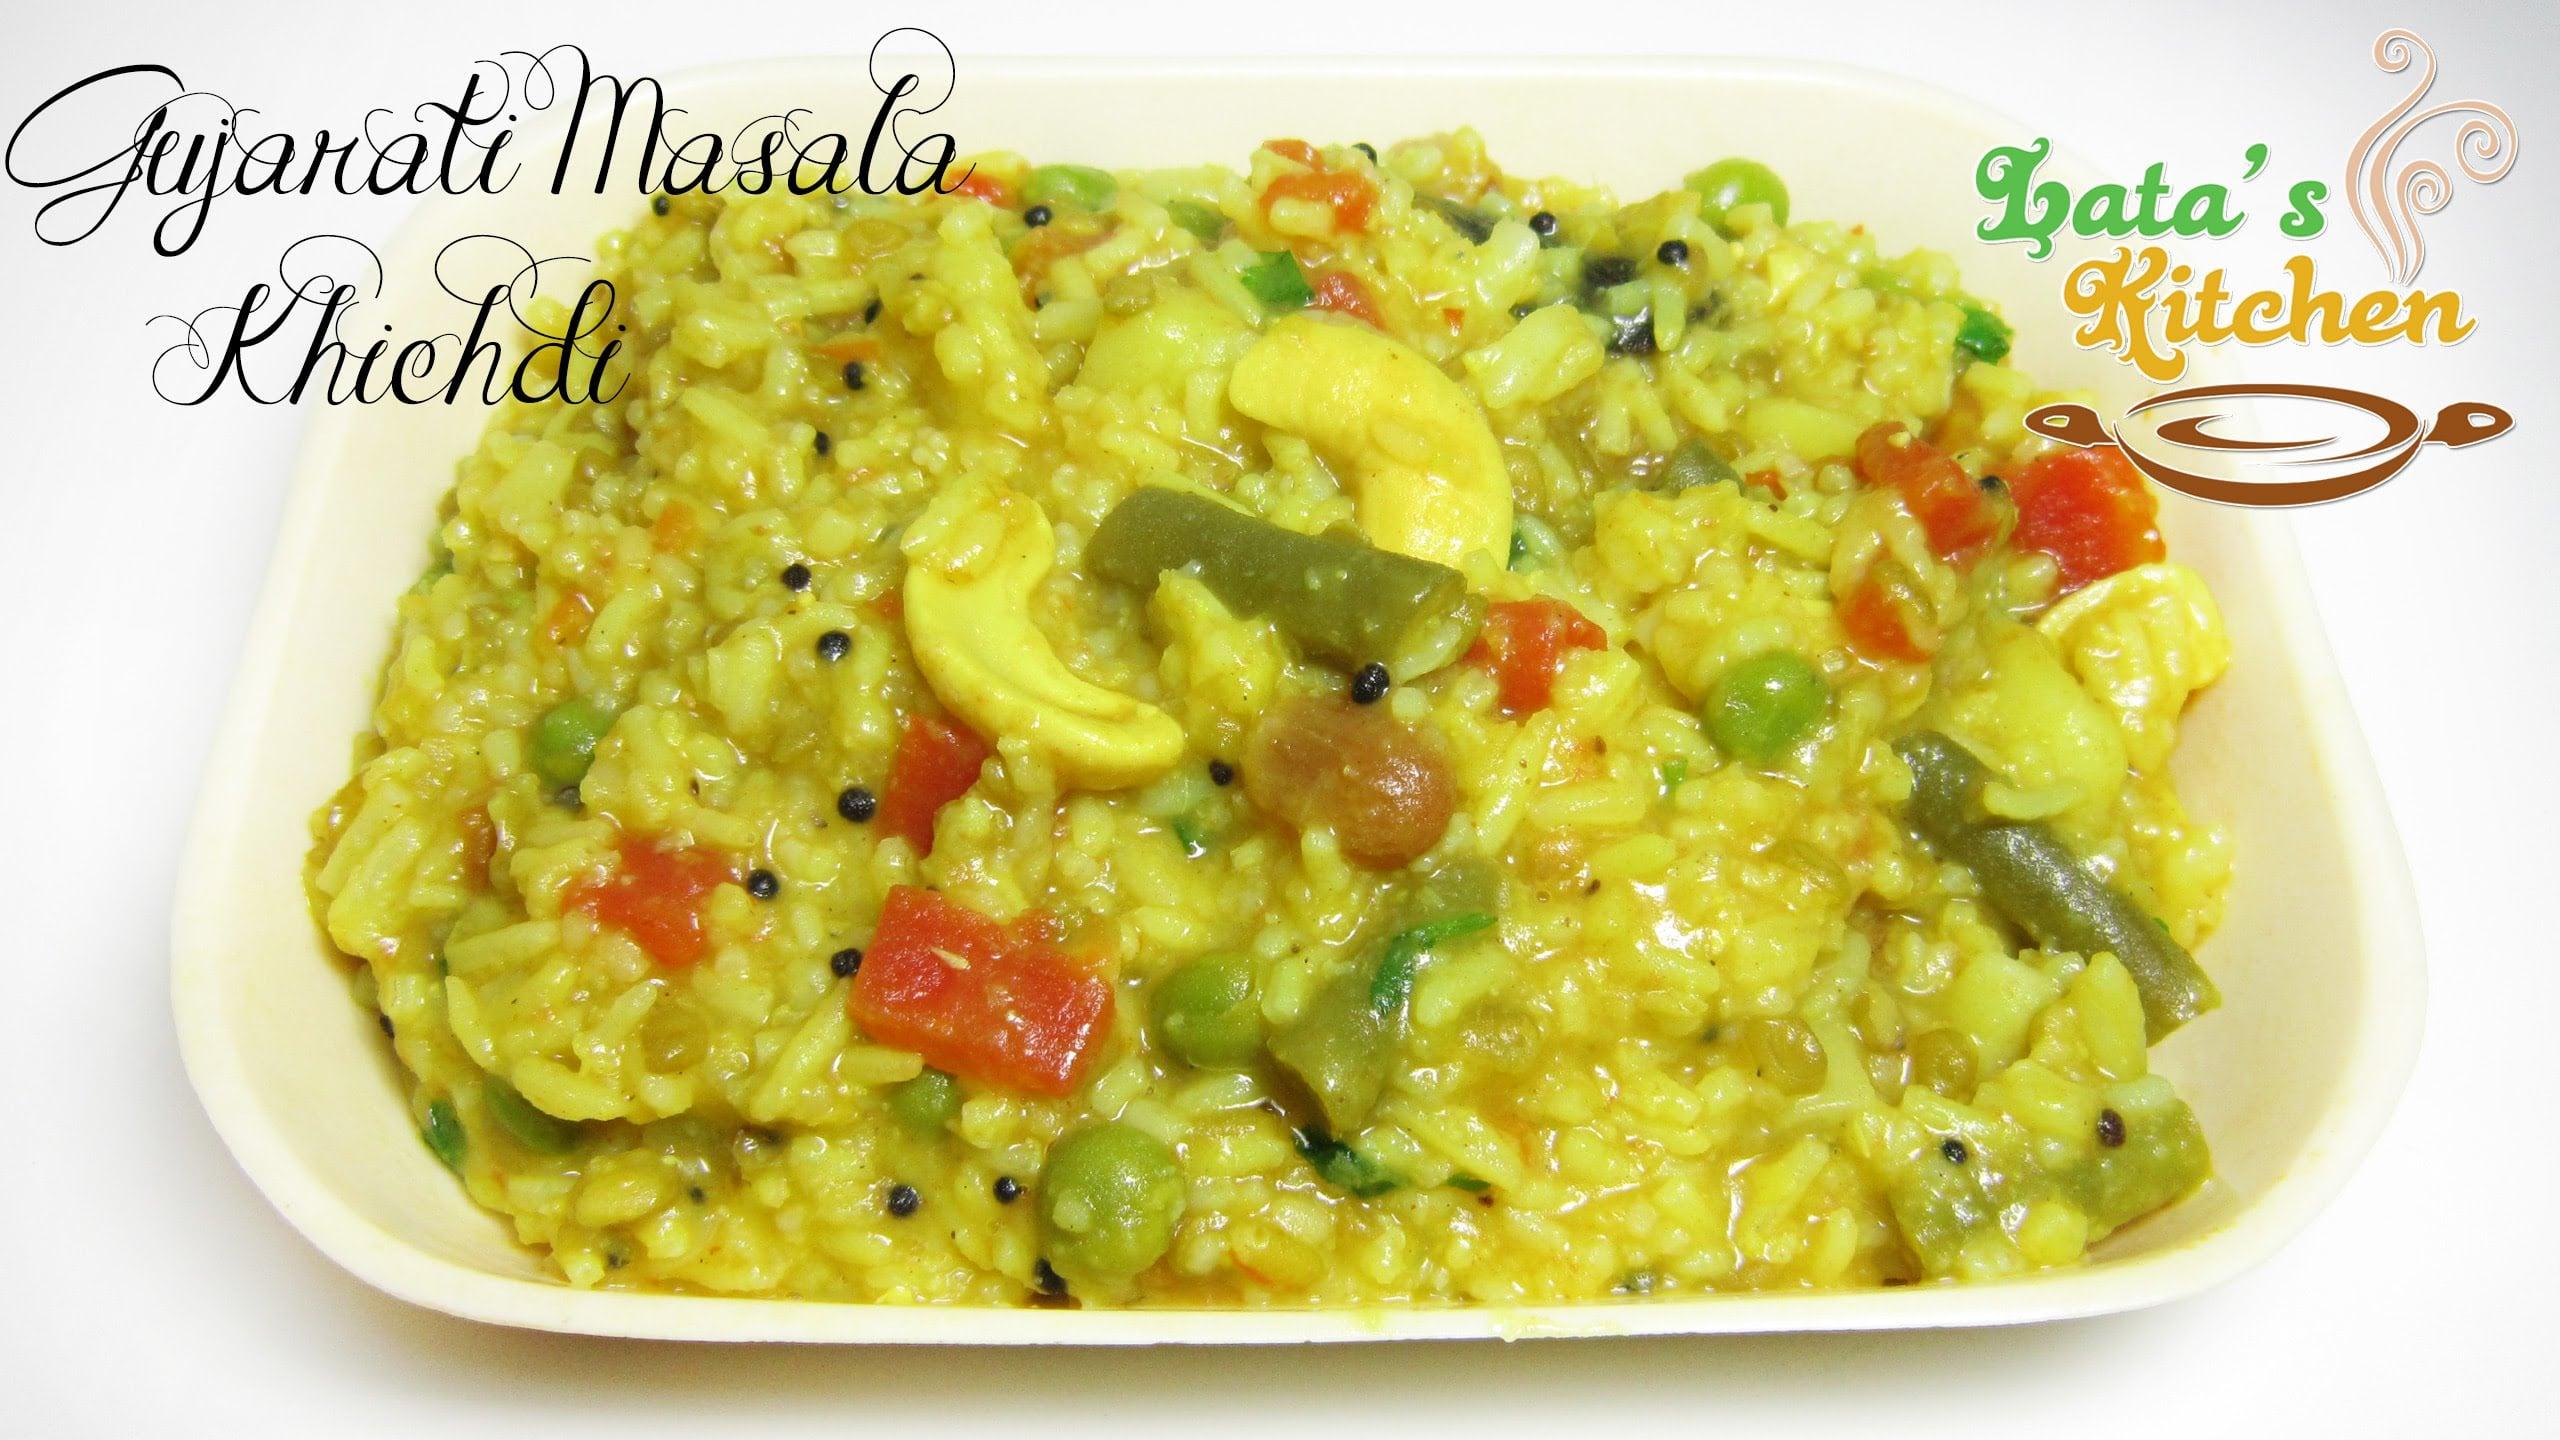 Gujarati Masala Khichdi Recipe — Indian Vegetarian Recipe Video in Hindi with English Subtitles